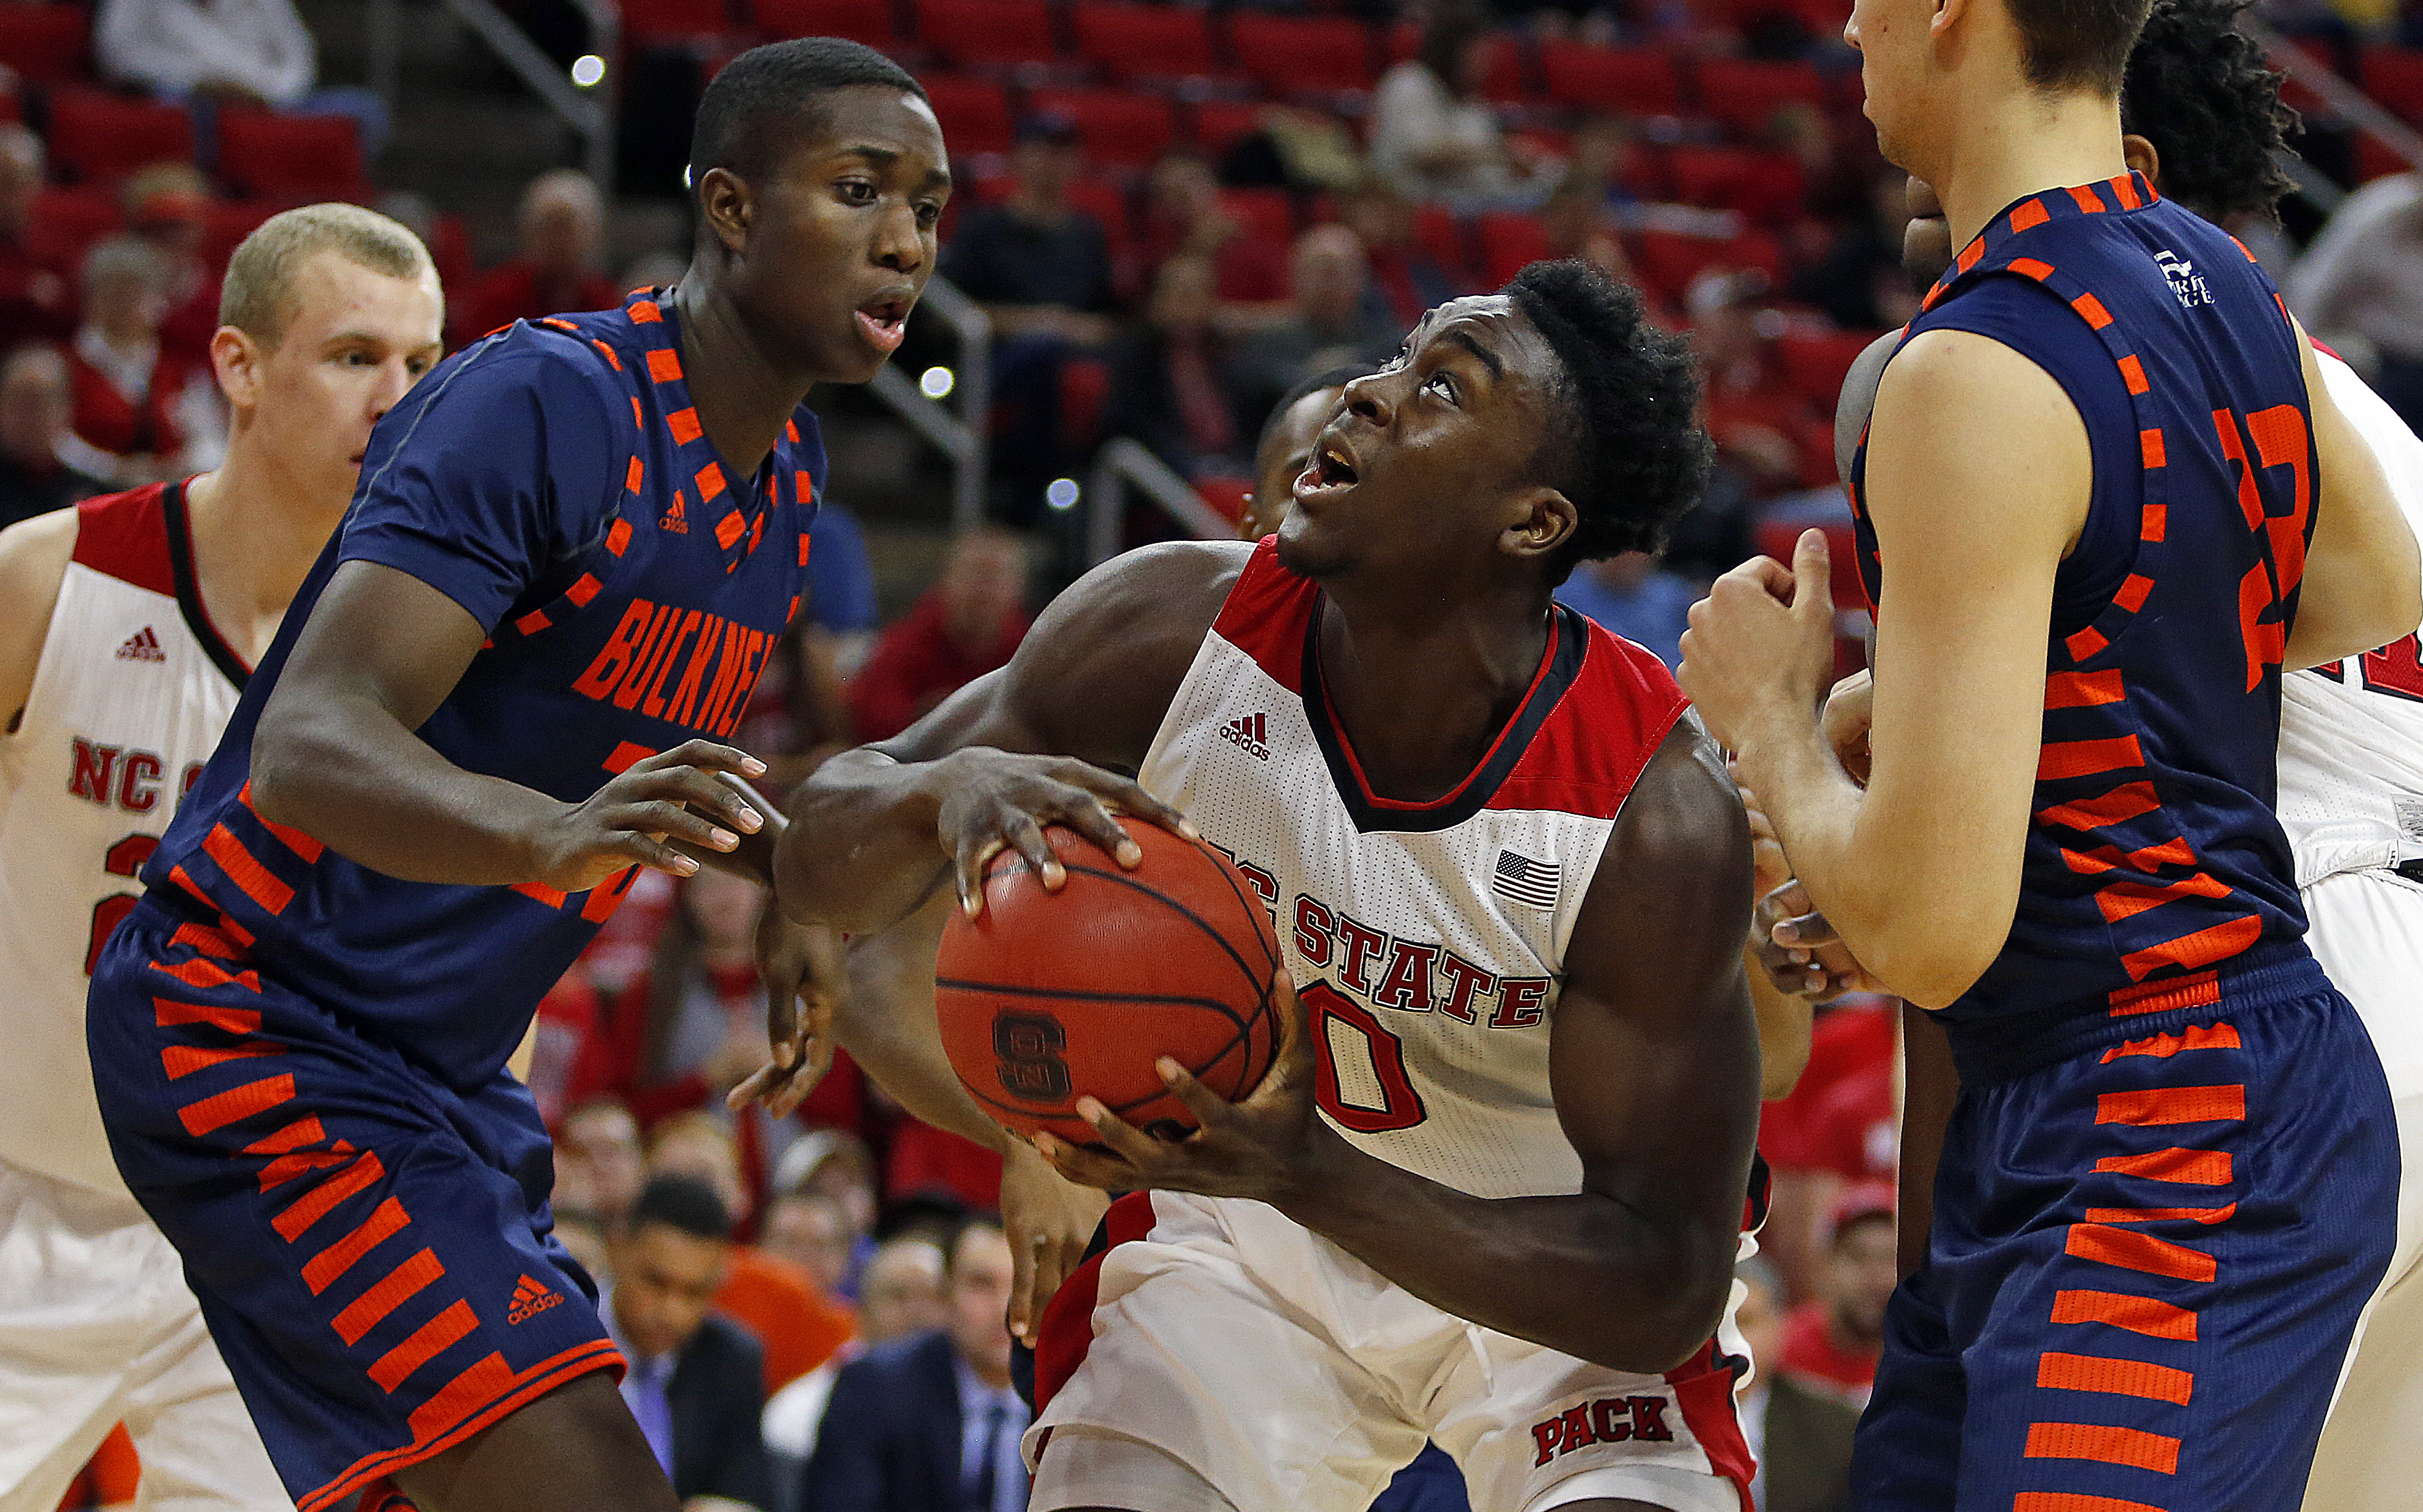 North Carolina State's Abdul-Malik Abu (0) battles between Bucknell's Nana Foulland (20) and Zach Thomas (23) during the first half of an NCAA college basketball game in Raleigh, N.C., Saturday, Dec. 5, 2015. (AP Photo/Karl B DeBlaker)